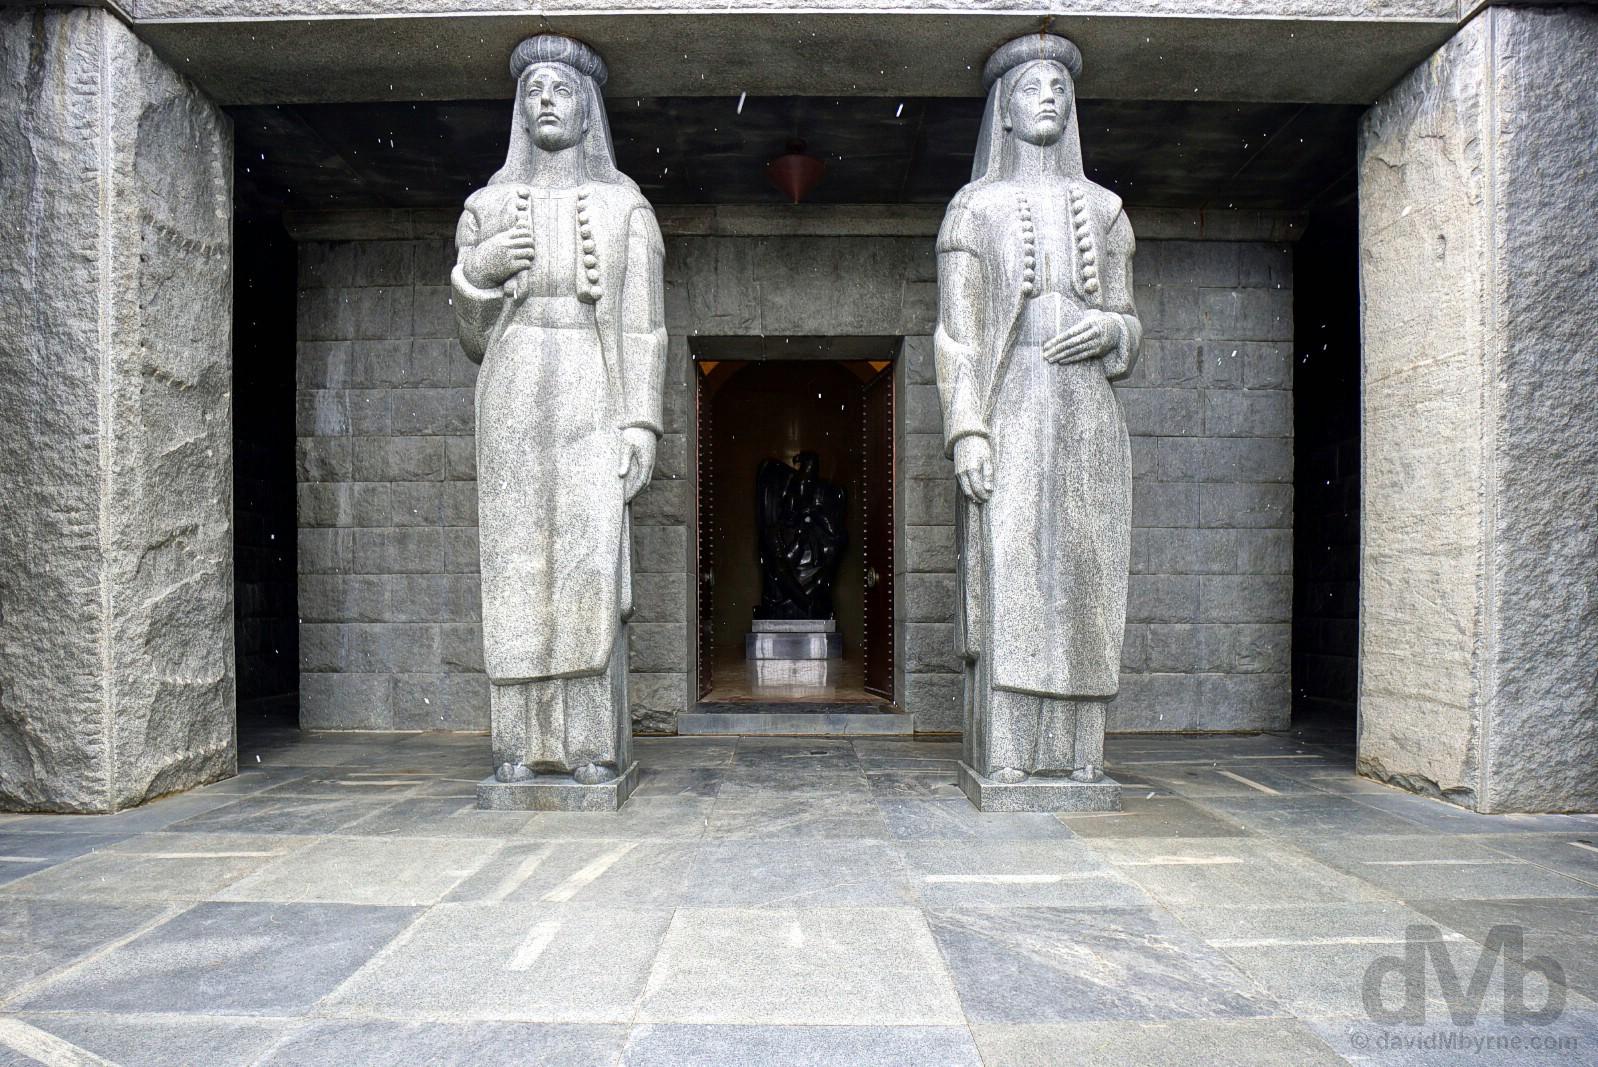 Njegos Mausoleum in Lovcen National Park, Montenegro. April 20, 2017.